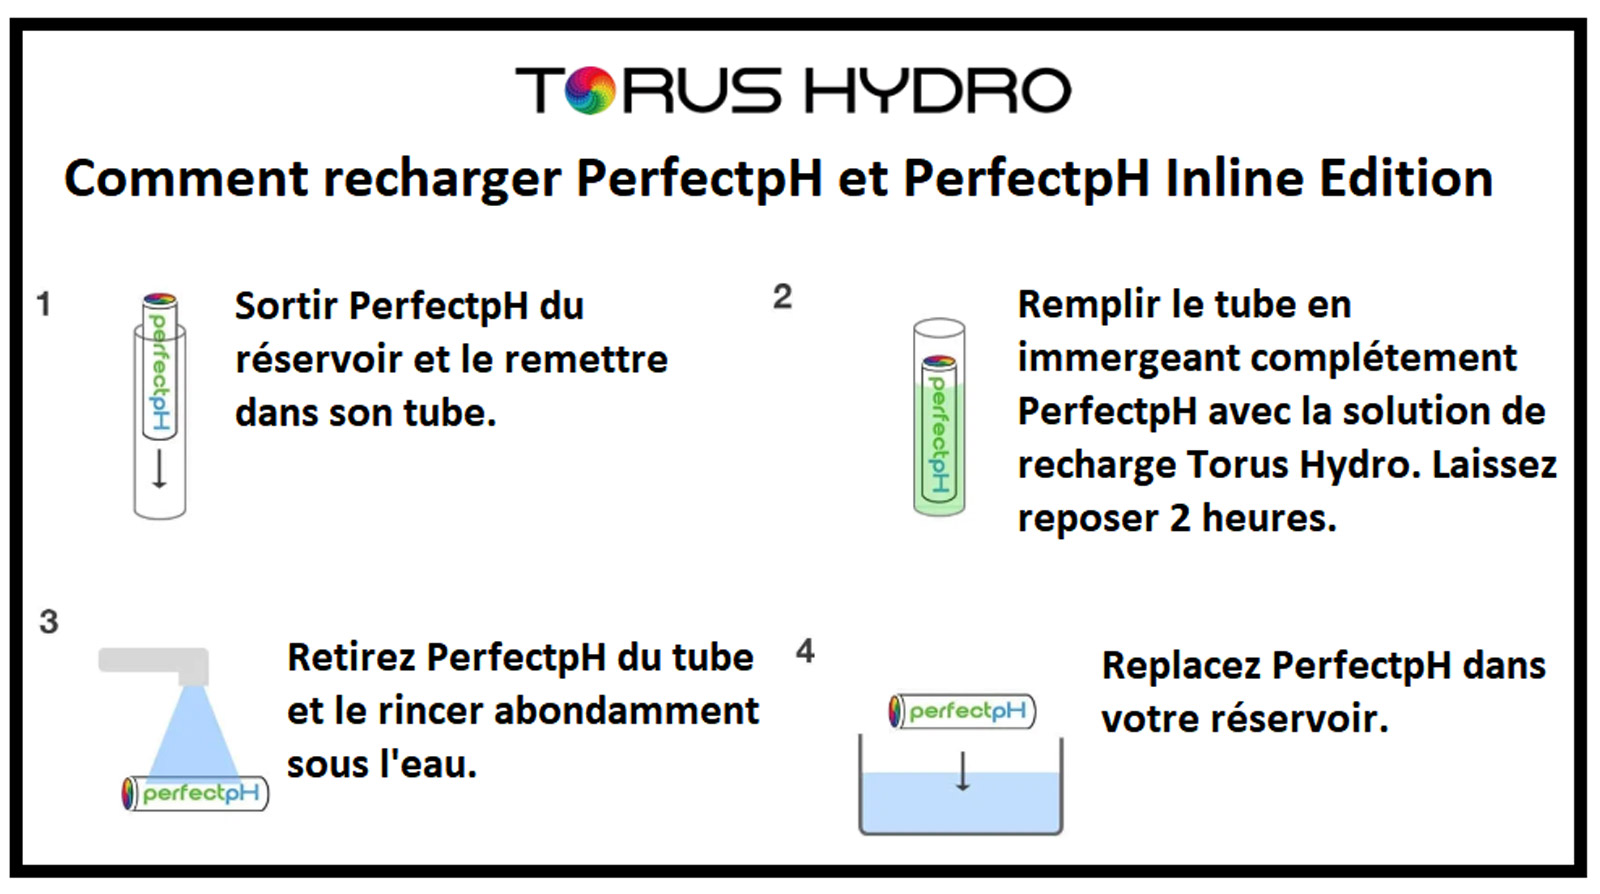 Recharger PerfectpH Torus Hydro